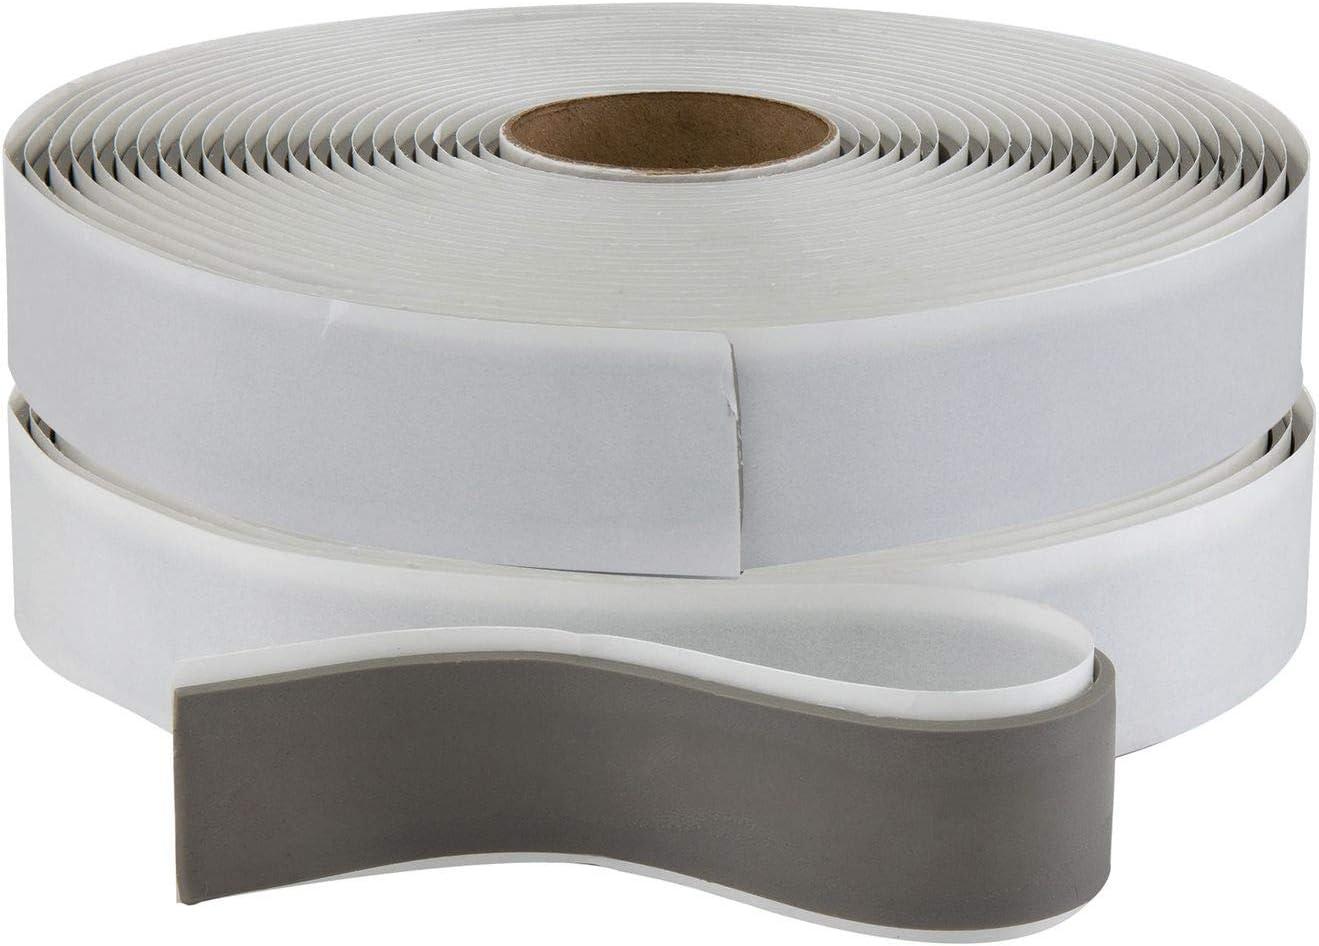 online shop Sale Dicor Butyl Seal Tape RV Sealant x 8